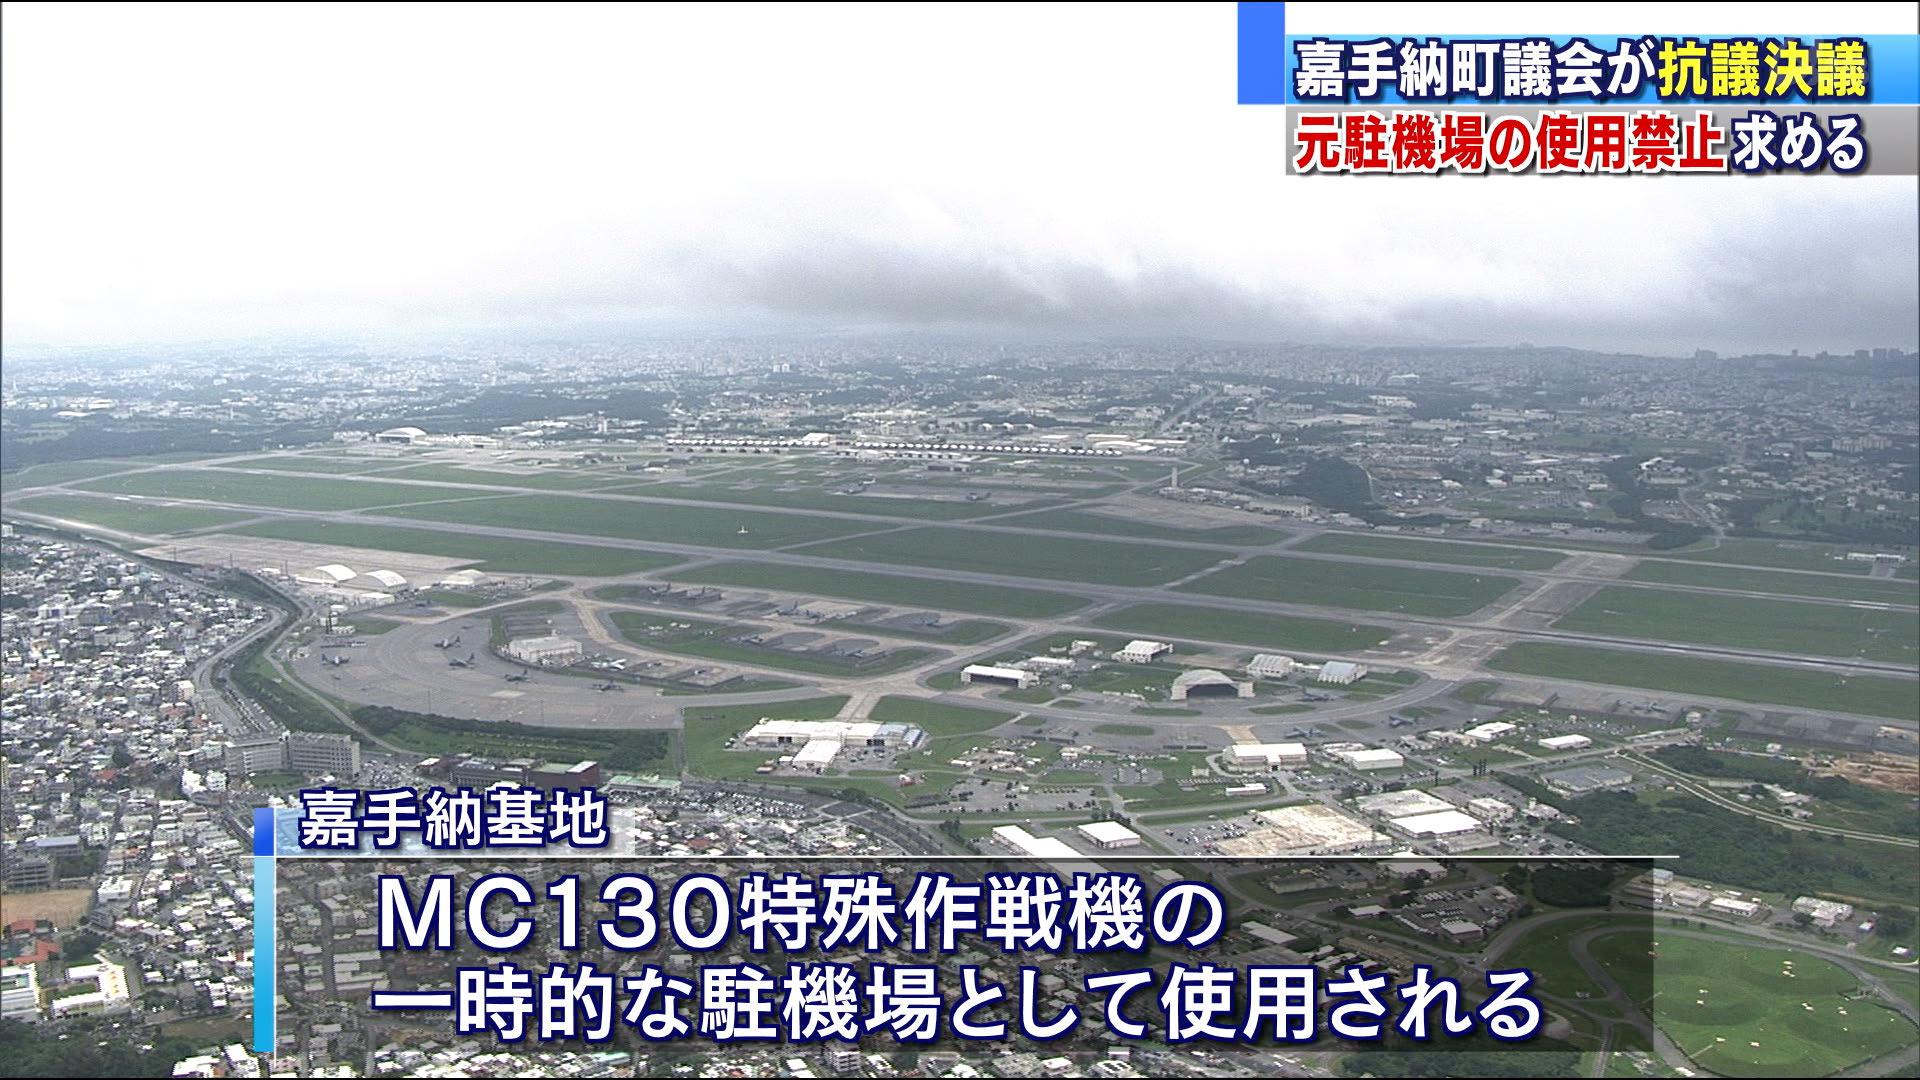 騒音と悪臭増加 元駐機場使用禁止求め抗議決議